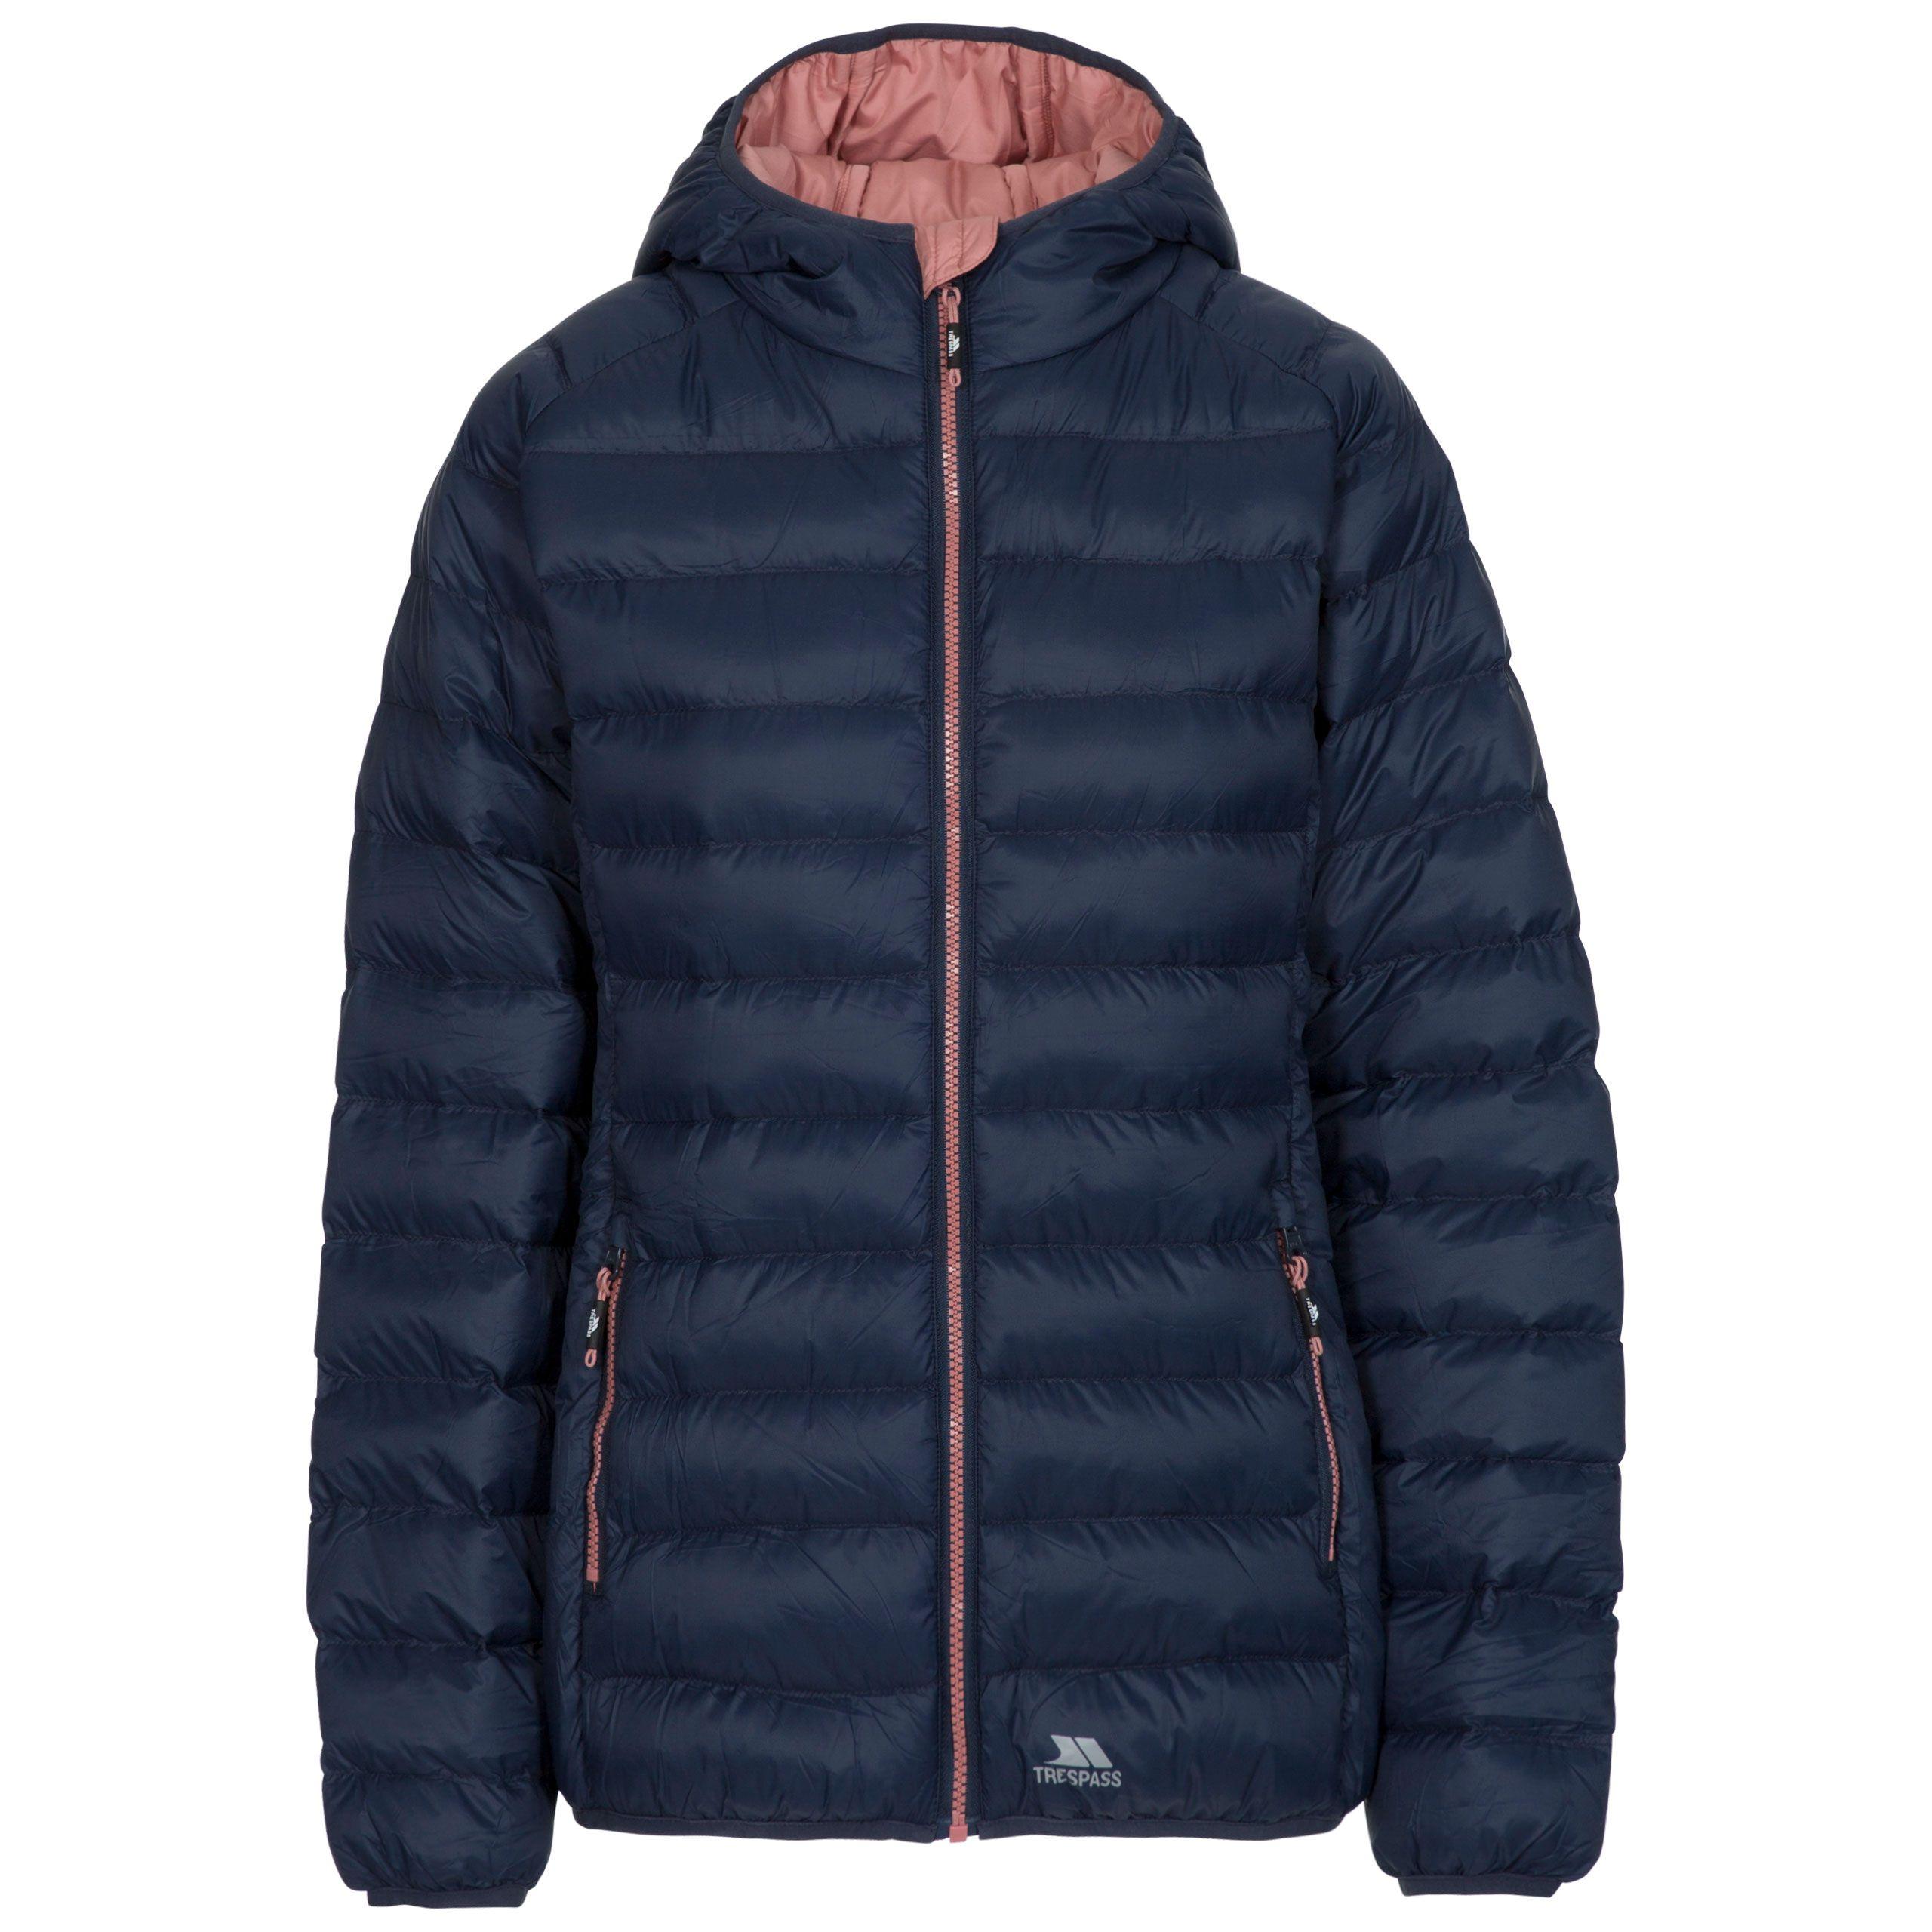 Abigail Womens Casual Jacket